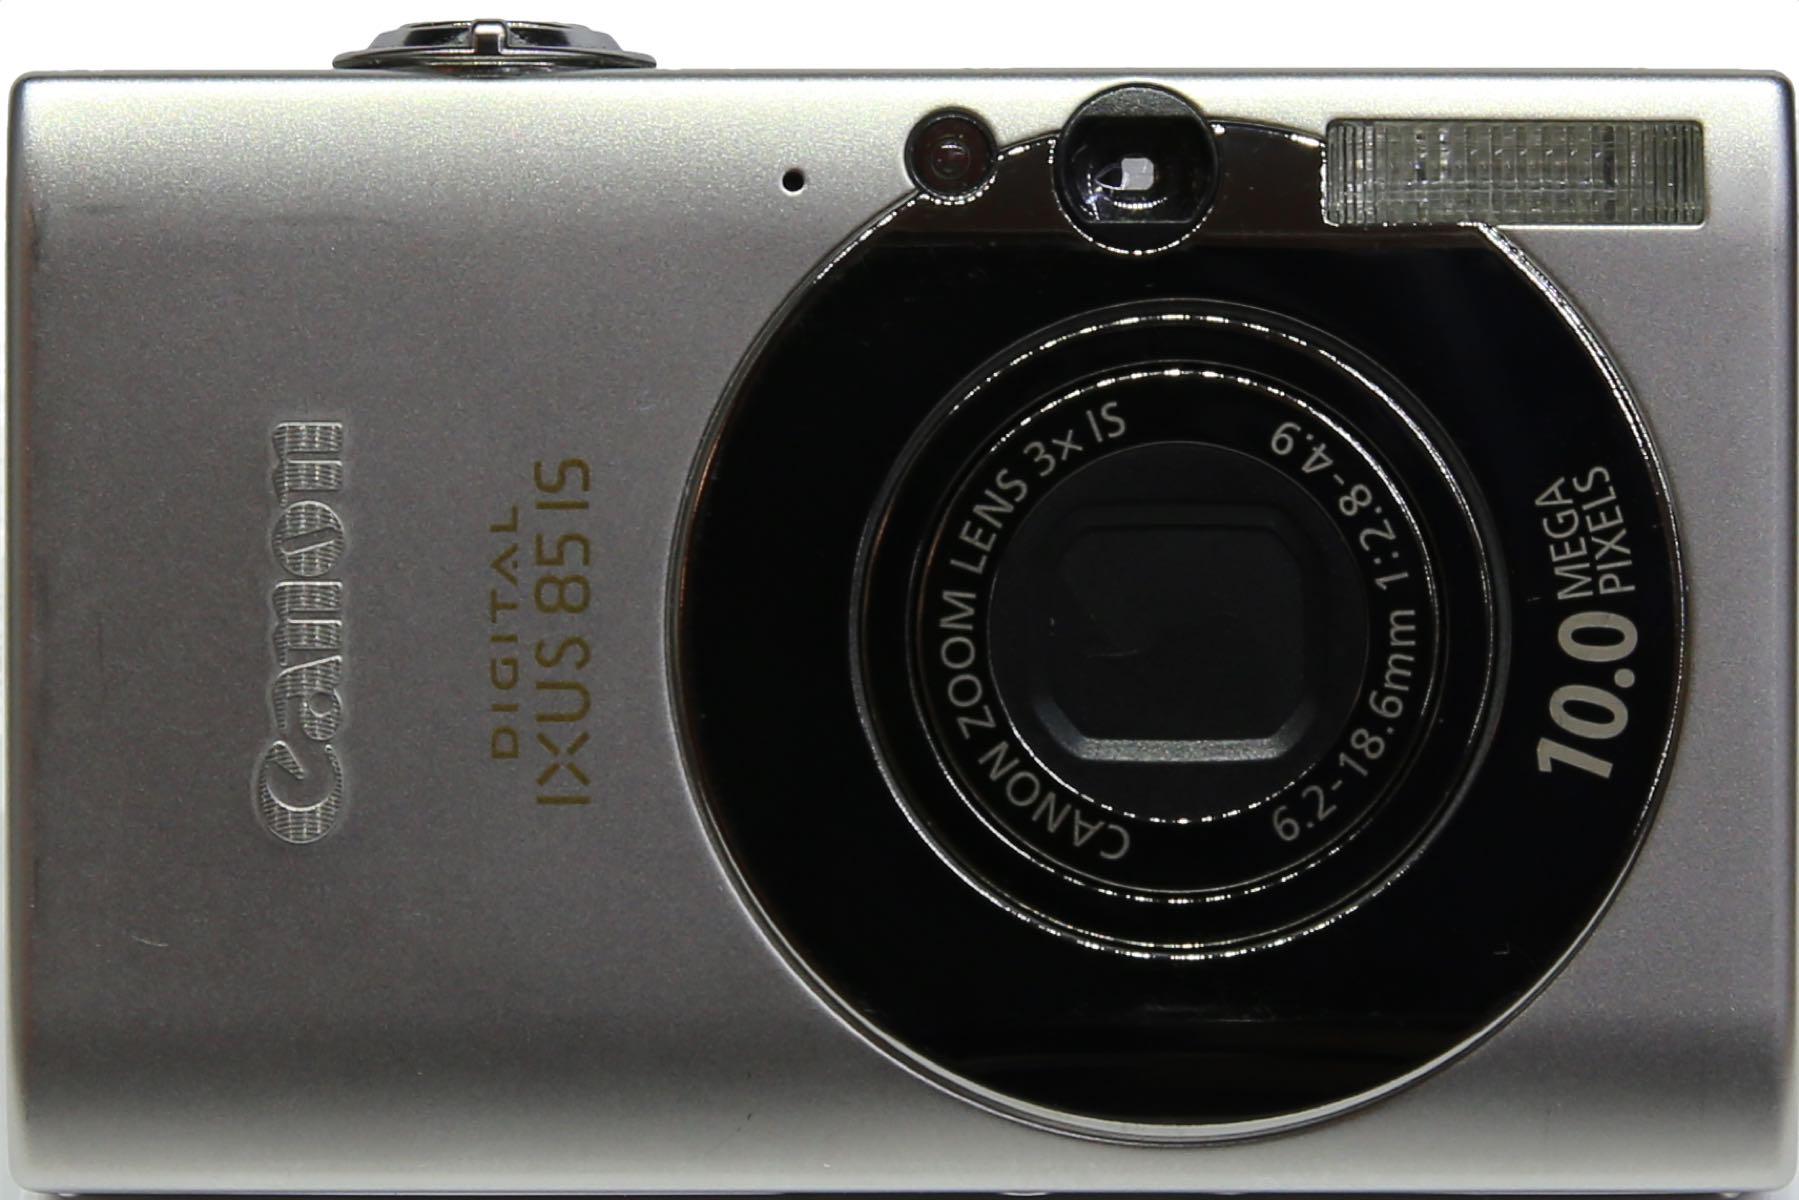 Ixus 85 IS